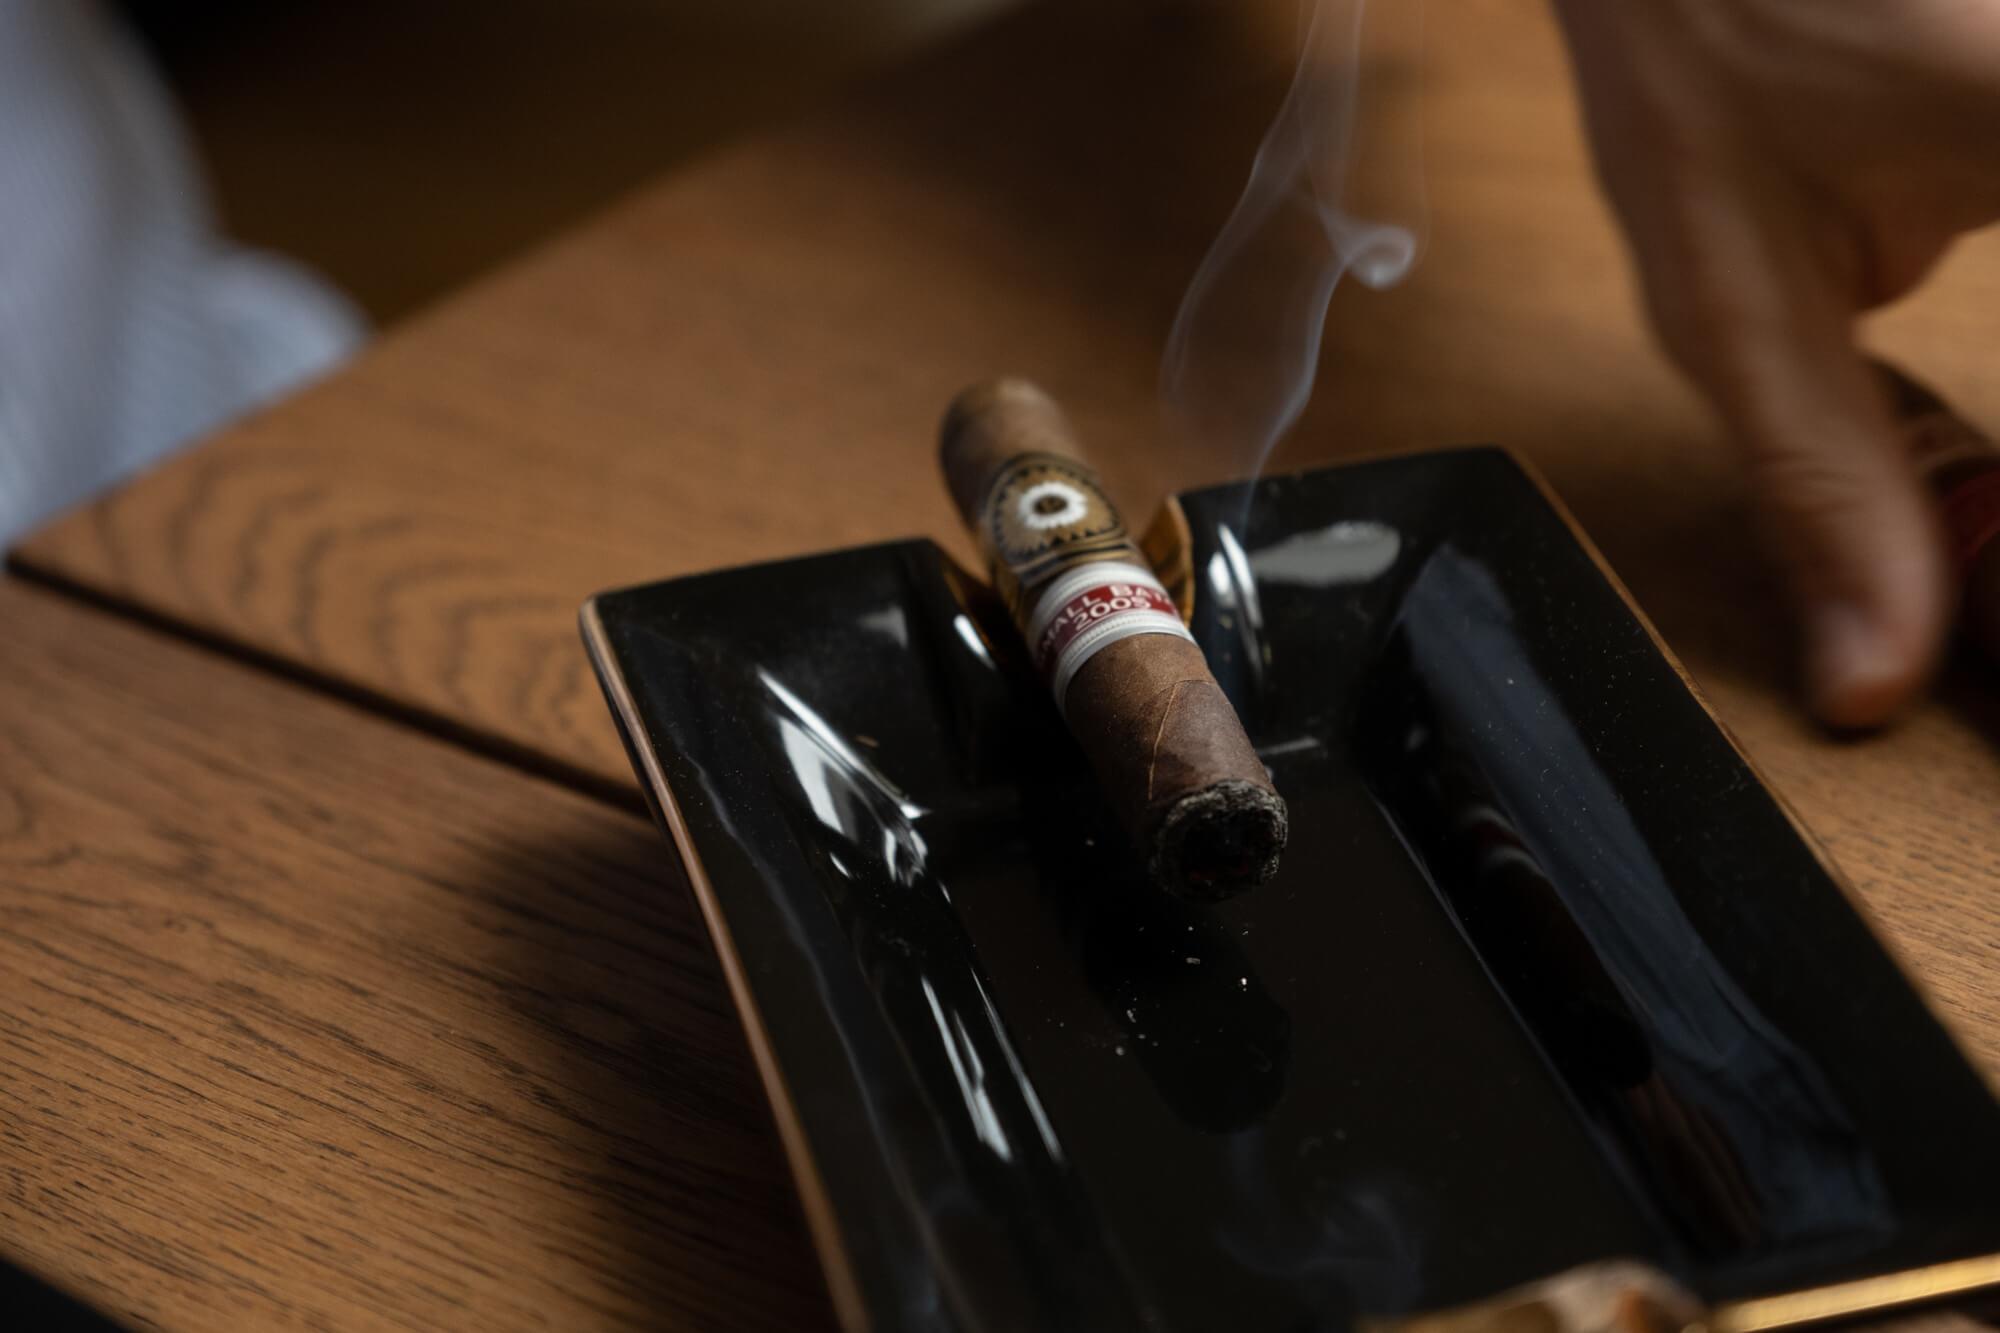 palące się cygaro